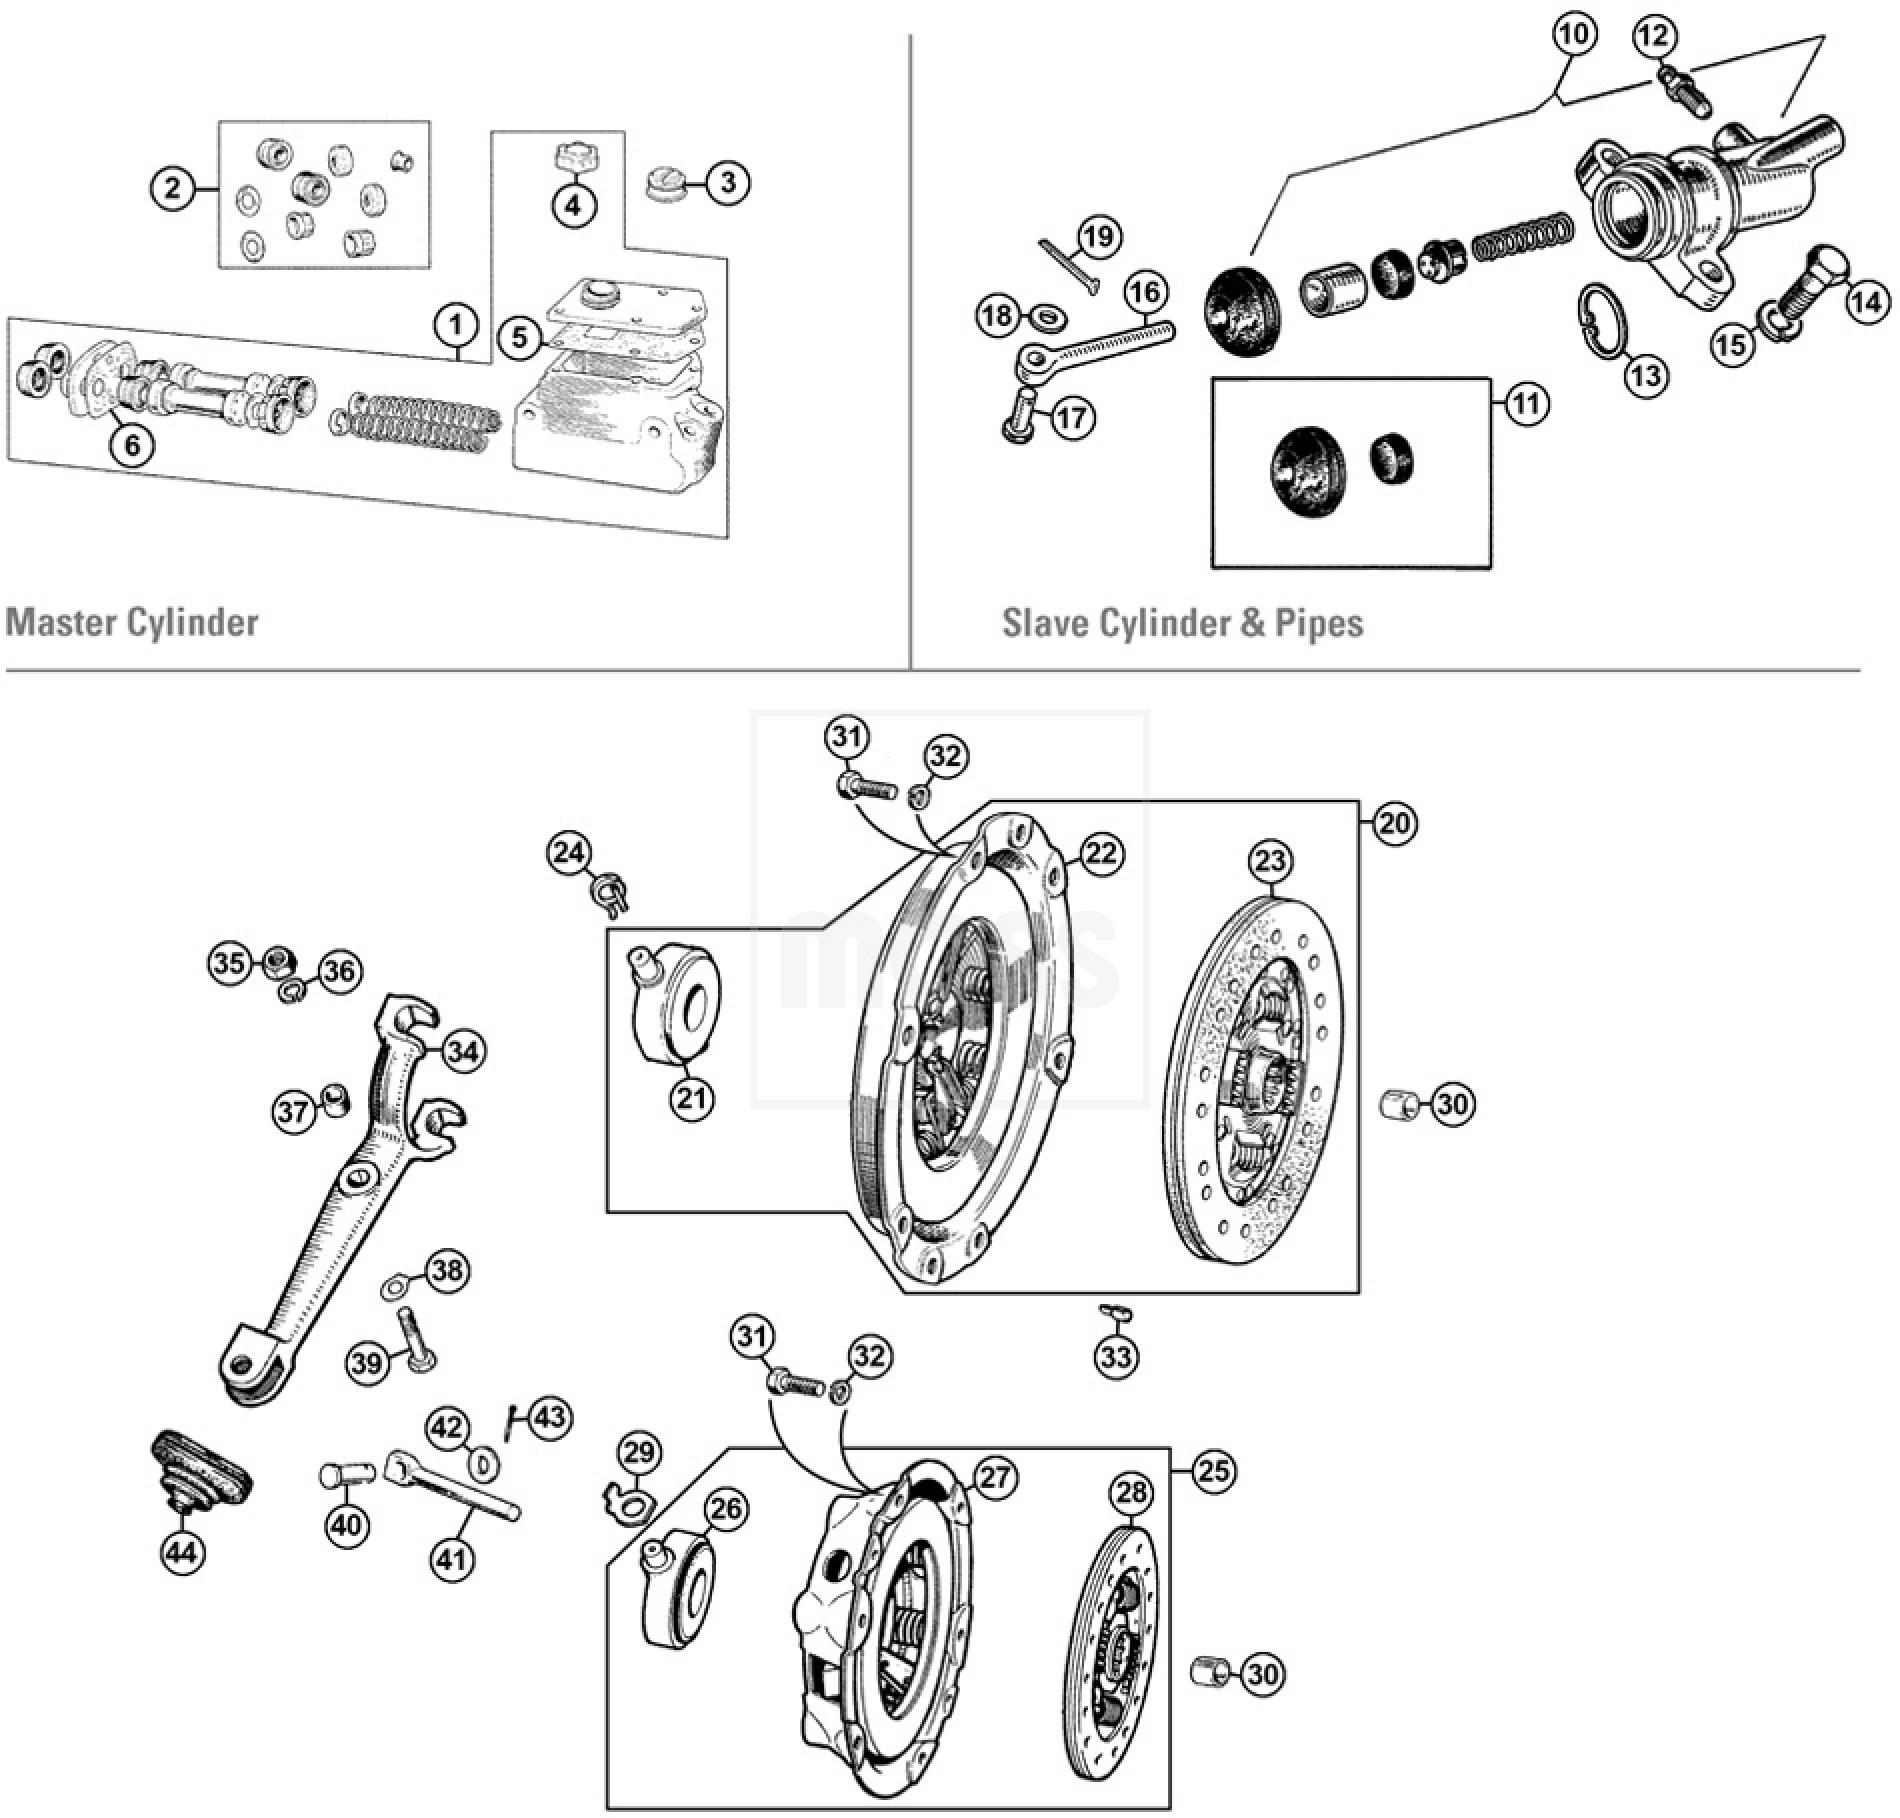 sm_14_03_01_3?quality\=80\&strip\=all wiring diagram triumph spitfire mk 3 trusted wiring diagram online